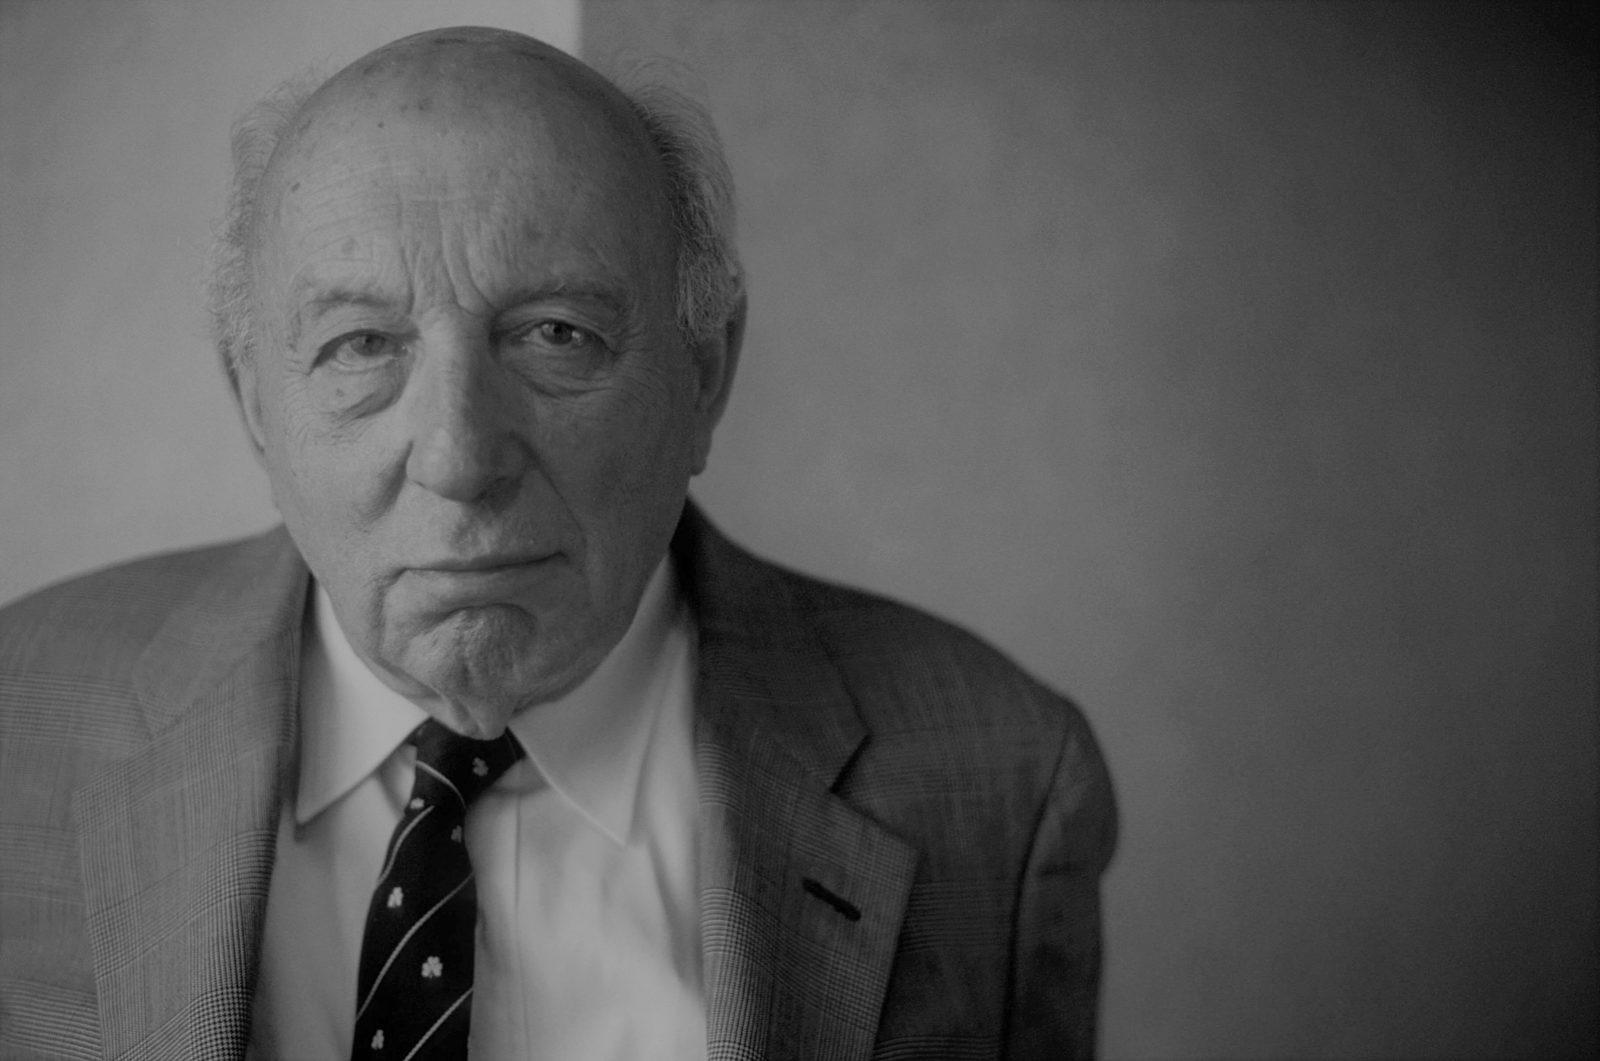 John Adalbert Lukacs, ecrivain. Photographie septembre 2006. ©Effigie/Leemage